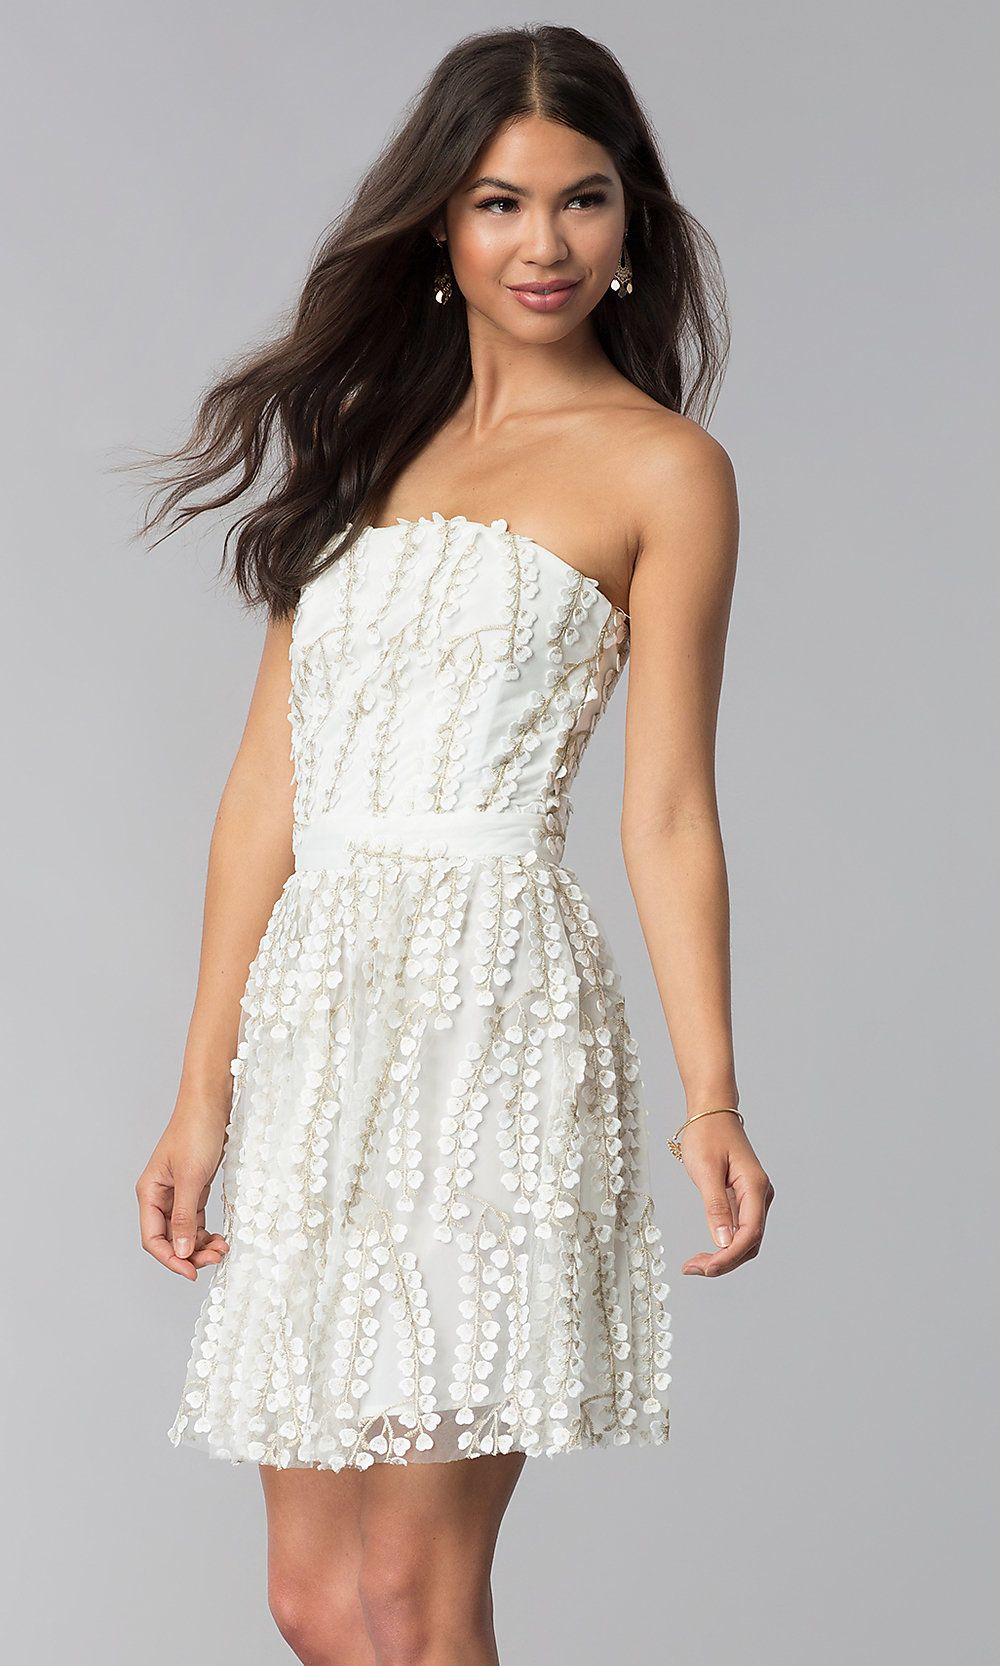 Strapless Ivory Lace Graduation Party Dress White Dress Party Embroidered Party Dress Graduation Party Dresses [ 1666 x 1000 Pixel ]